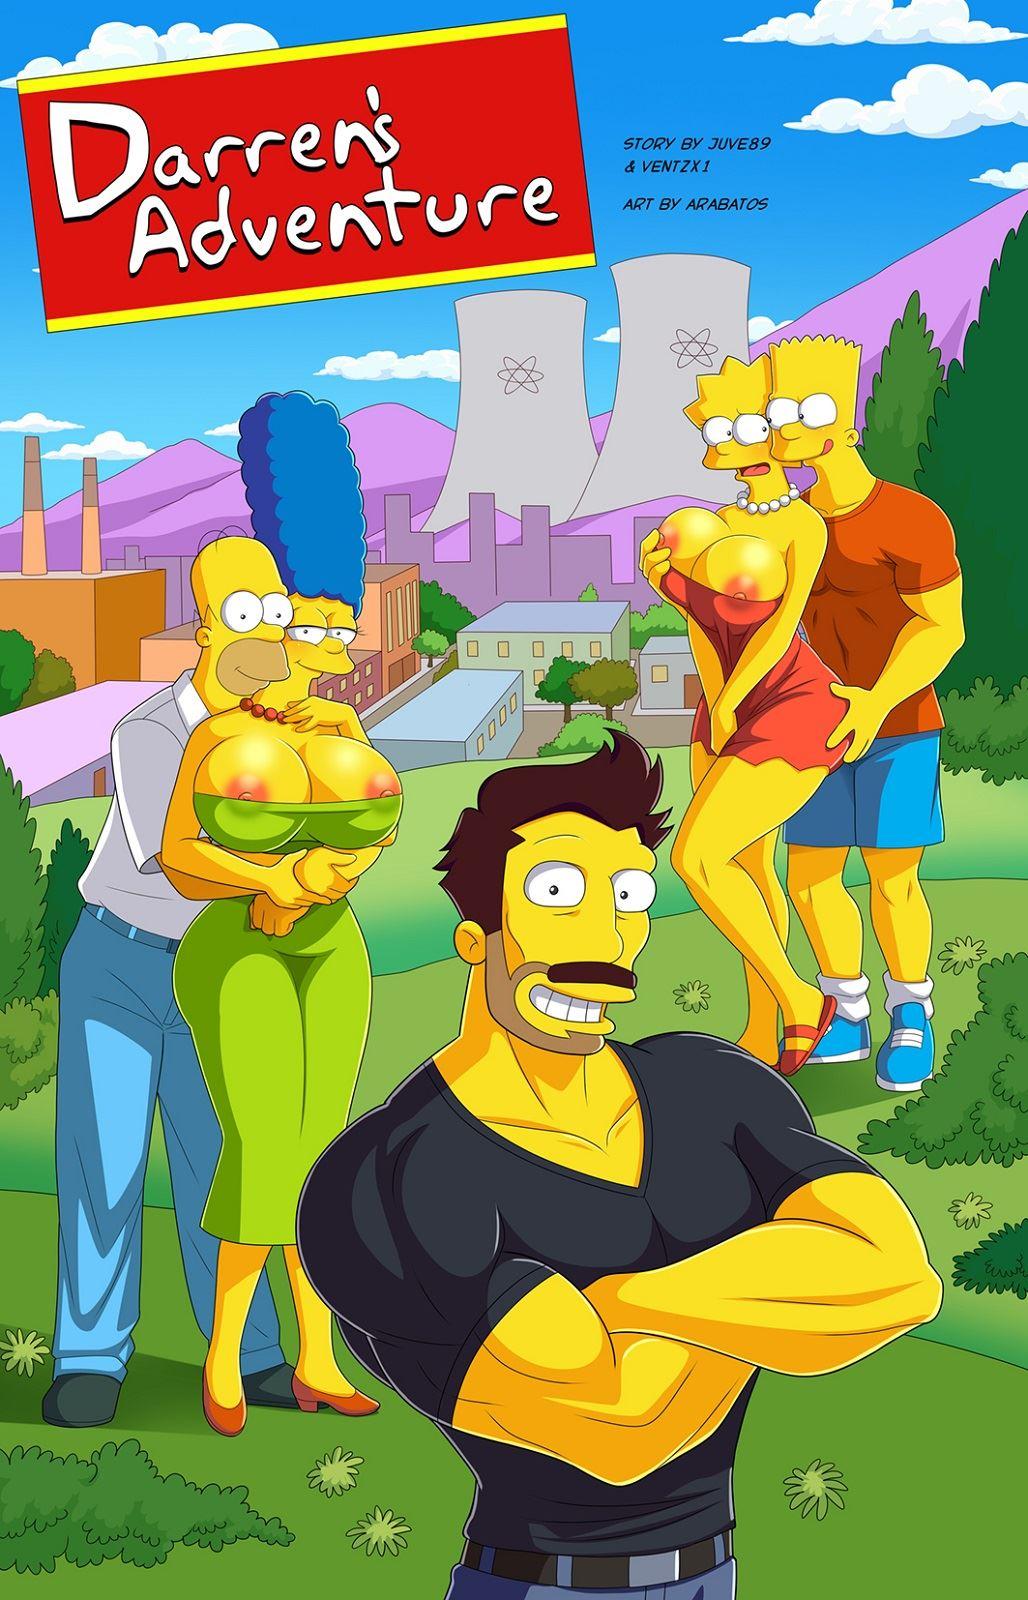 Los Simpsons XXX - La aventura de Darren